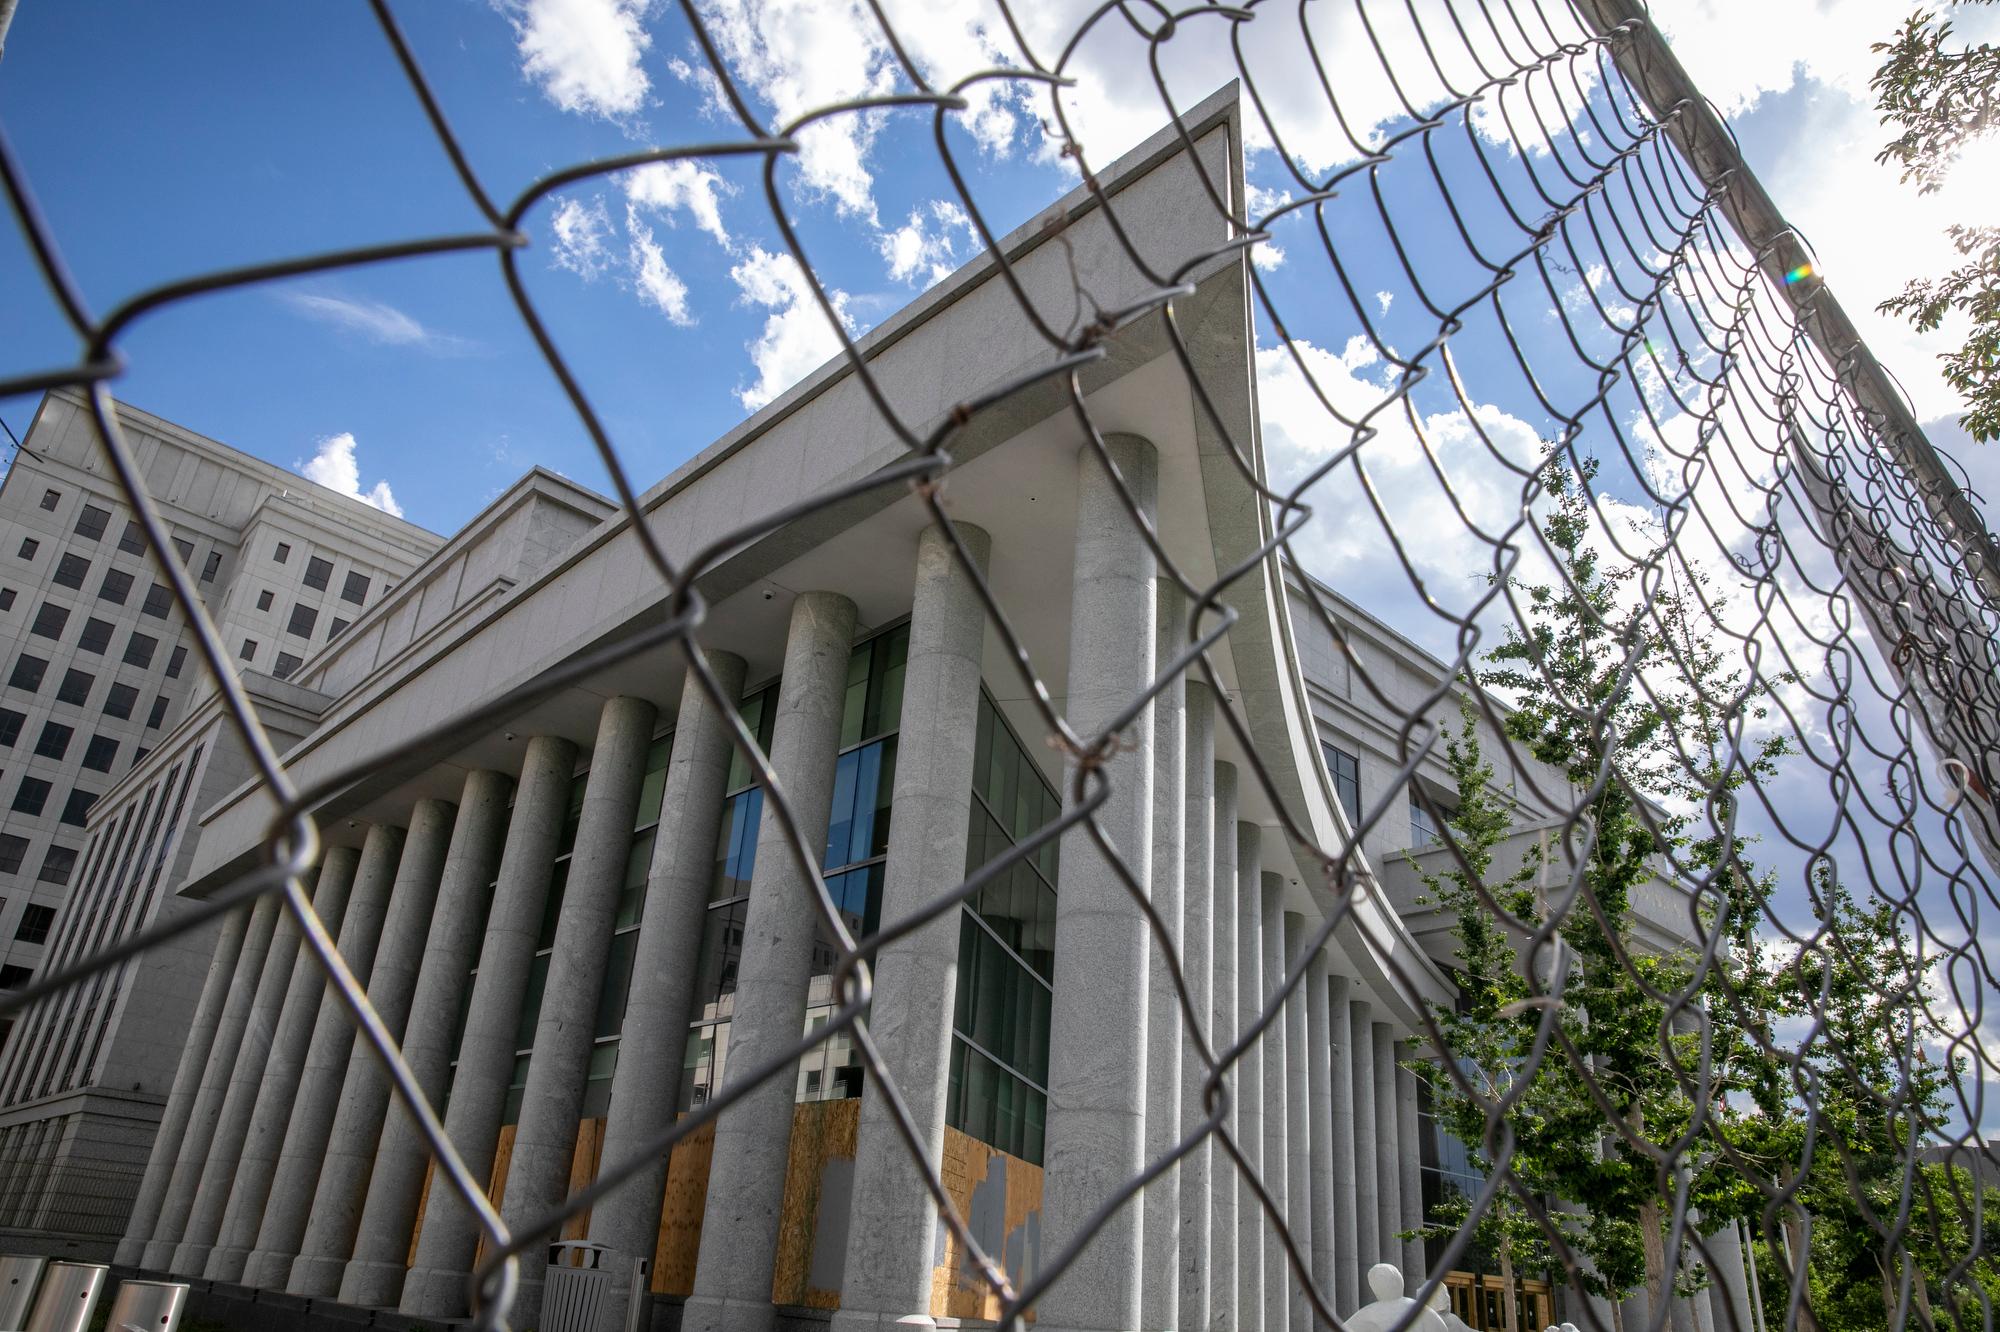 Colorado Supreme Court Behind Fence